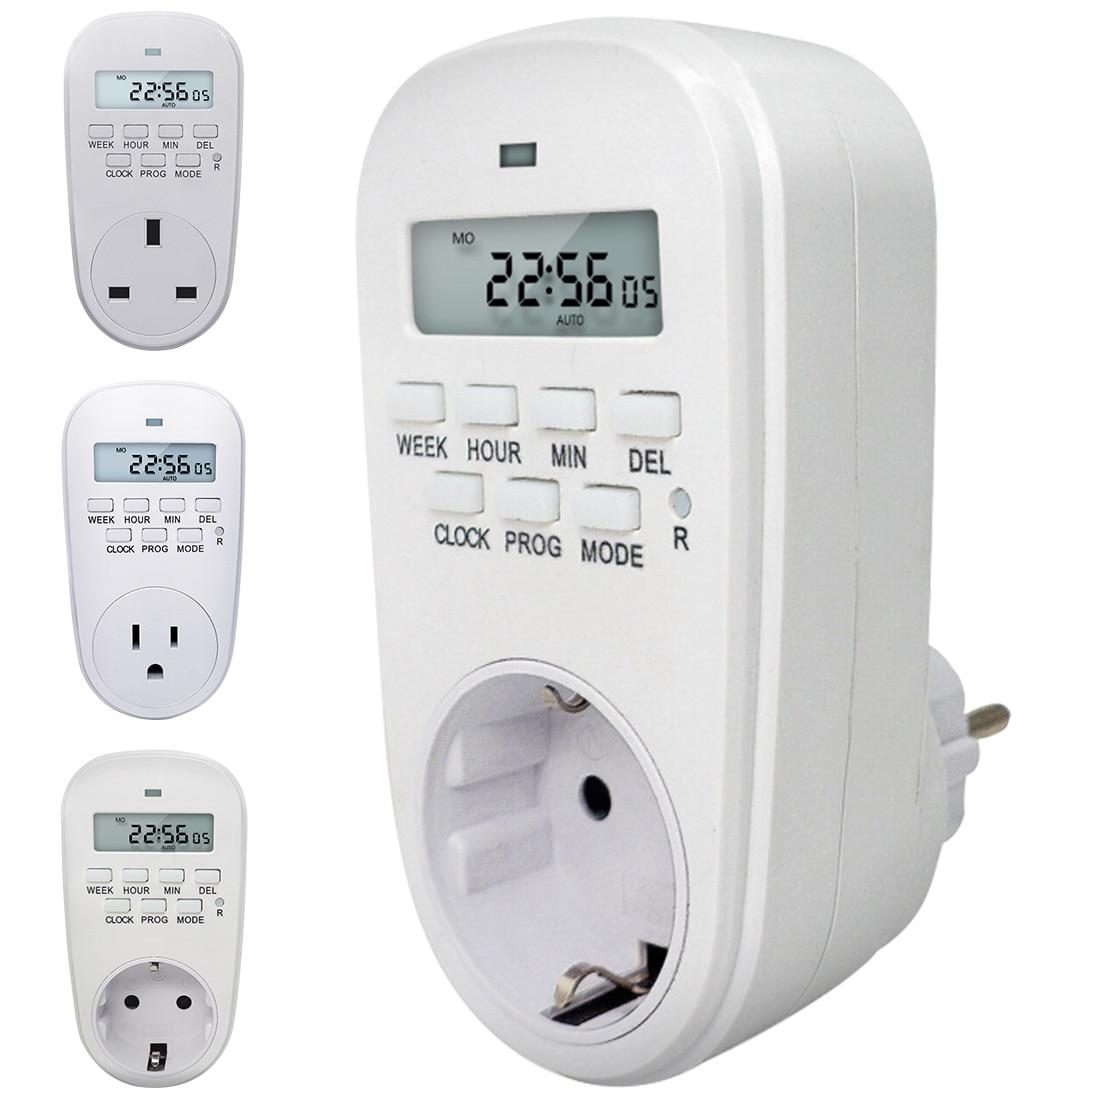 Hot Adjustable Programmable Setting of Clock/ On/ Off Time Digital Timer Switch Energy Saving Smart Power Socket EU /US/ UK Plug Timers     - title=